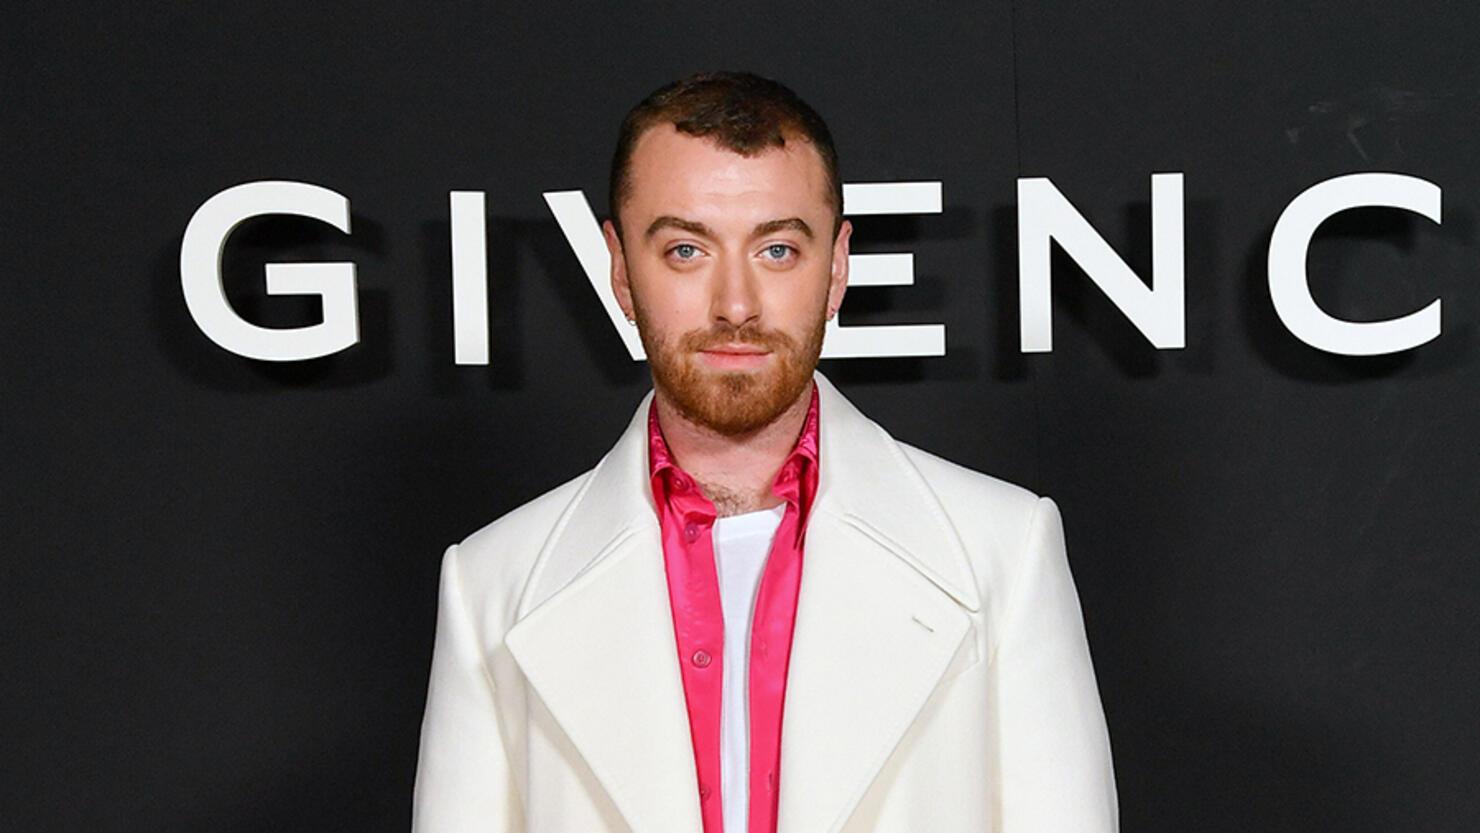 Givenchy : Front Row - Paris Fashion Week Womenswear Fall/Winter 2019/2020